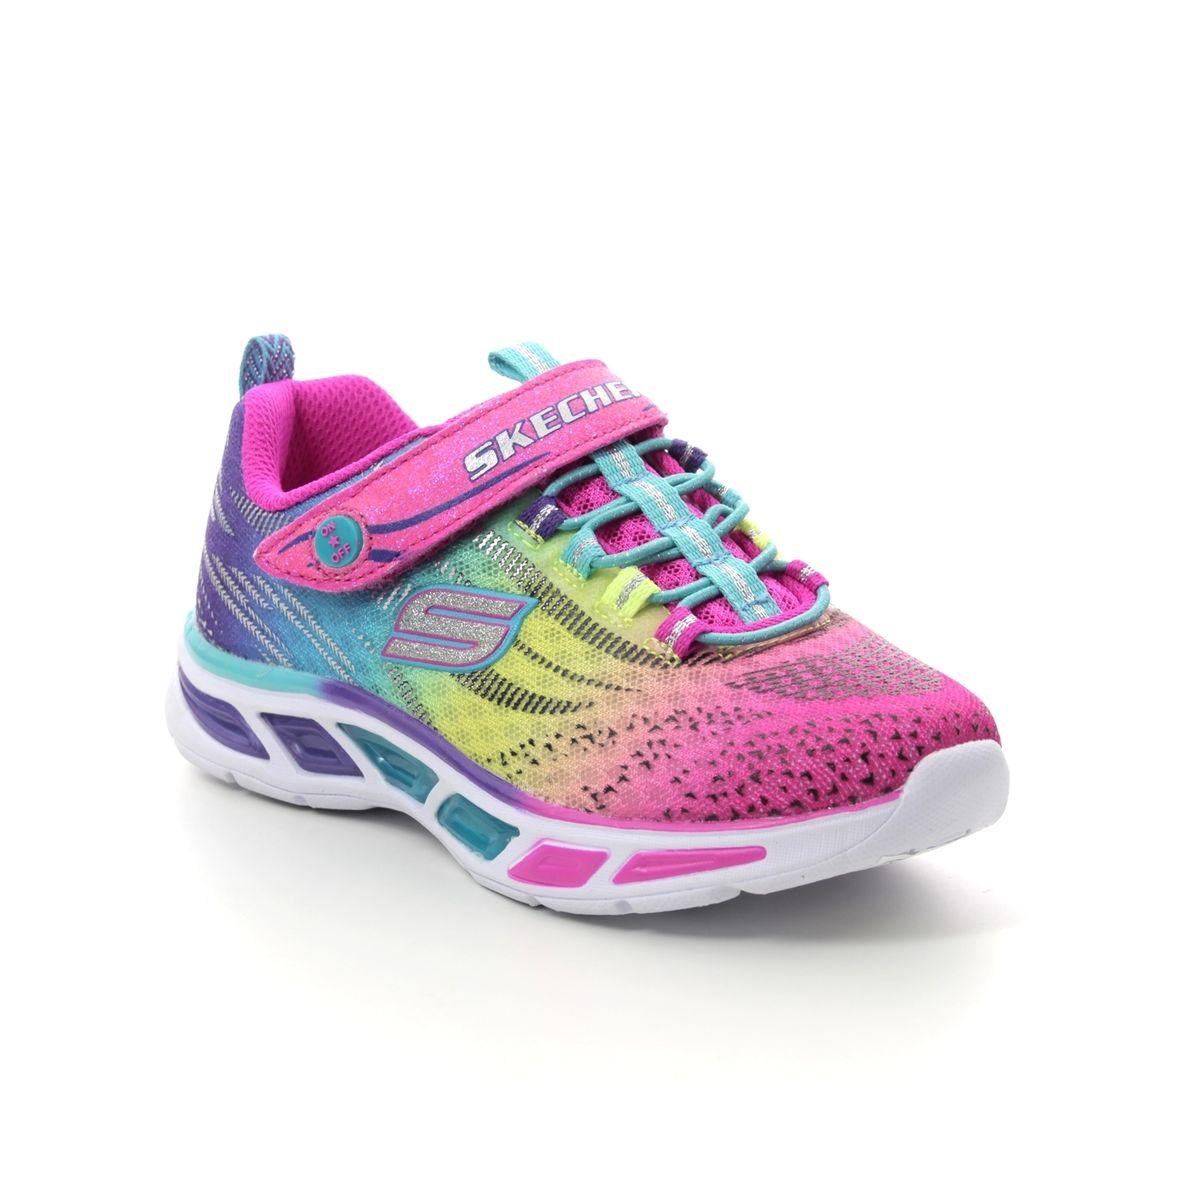 colorful skechers schoenen outlet